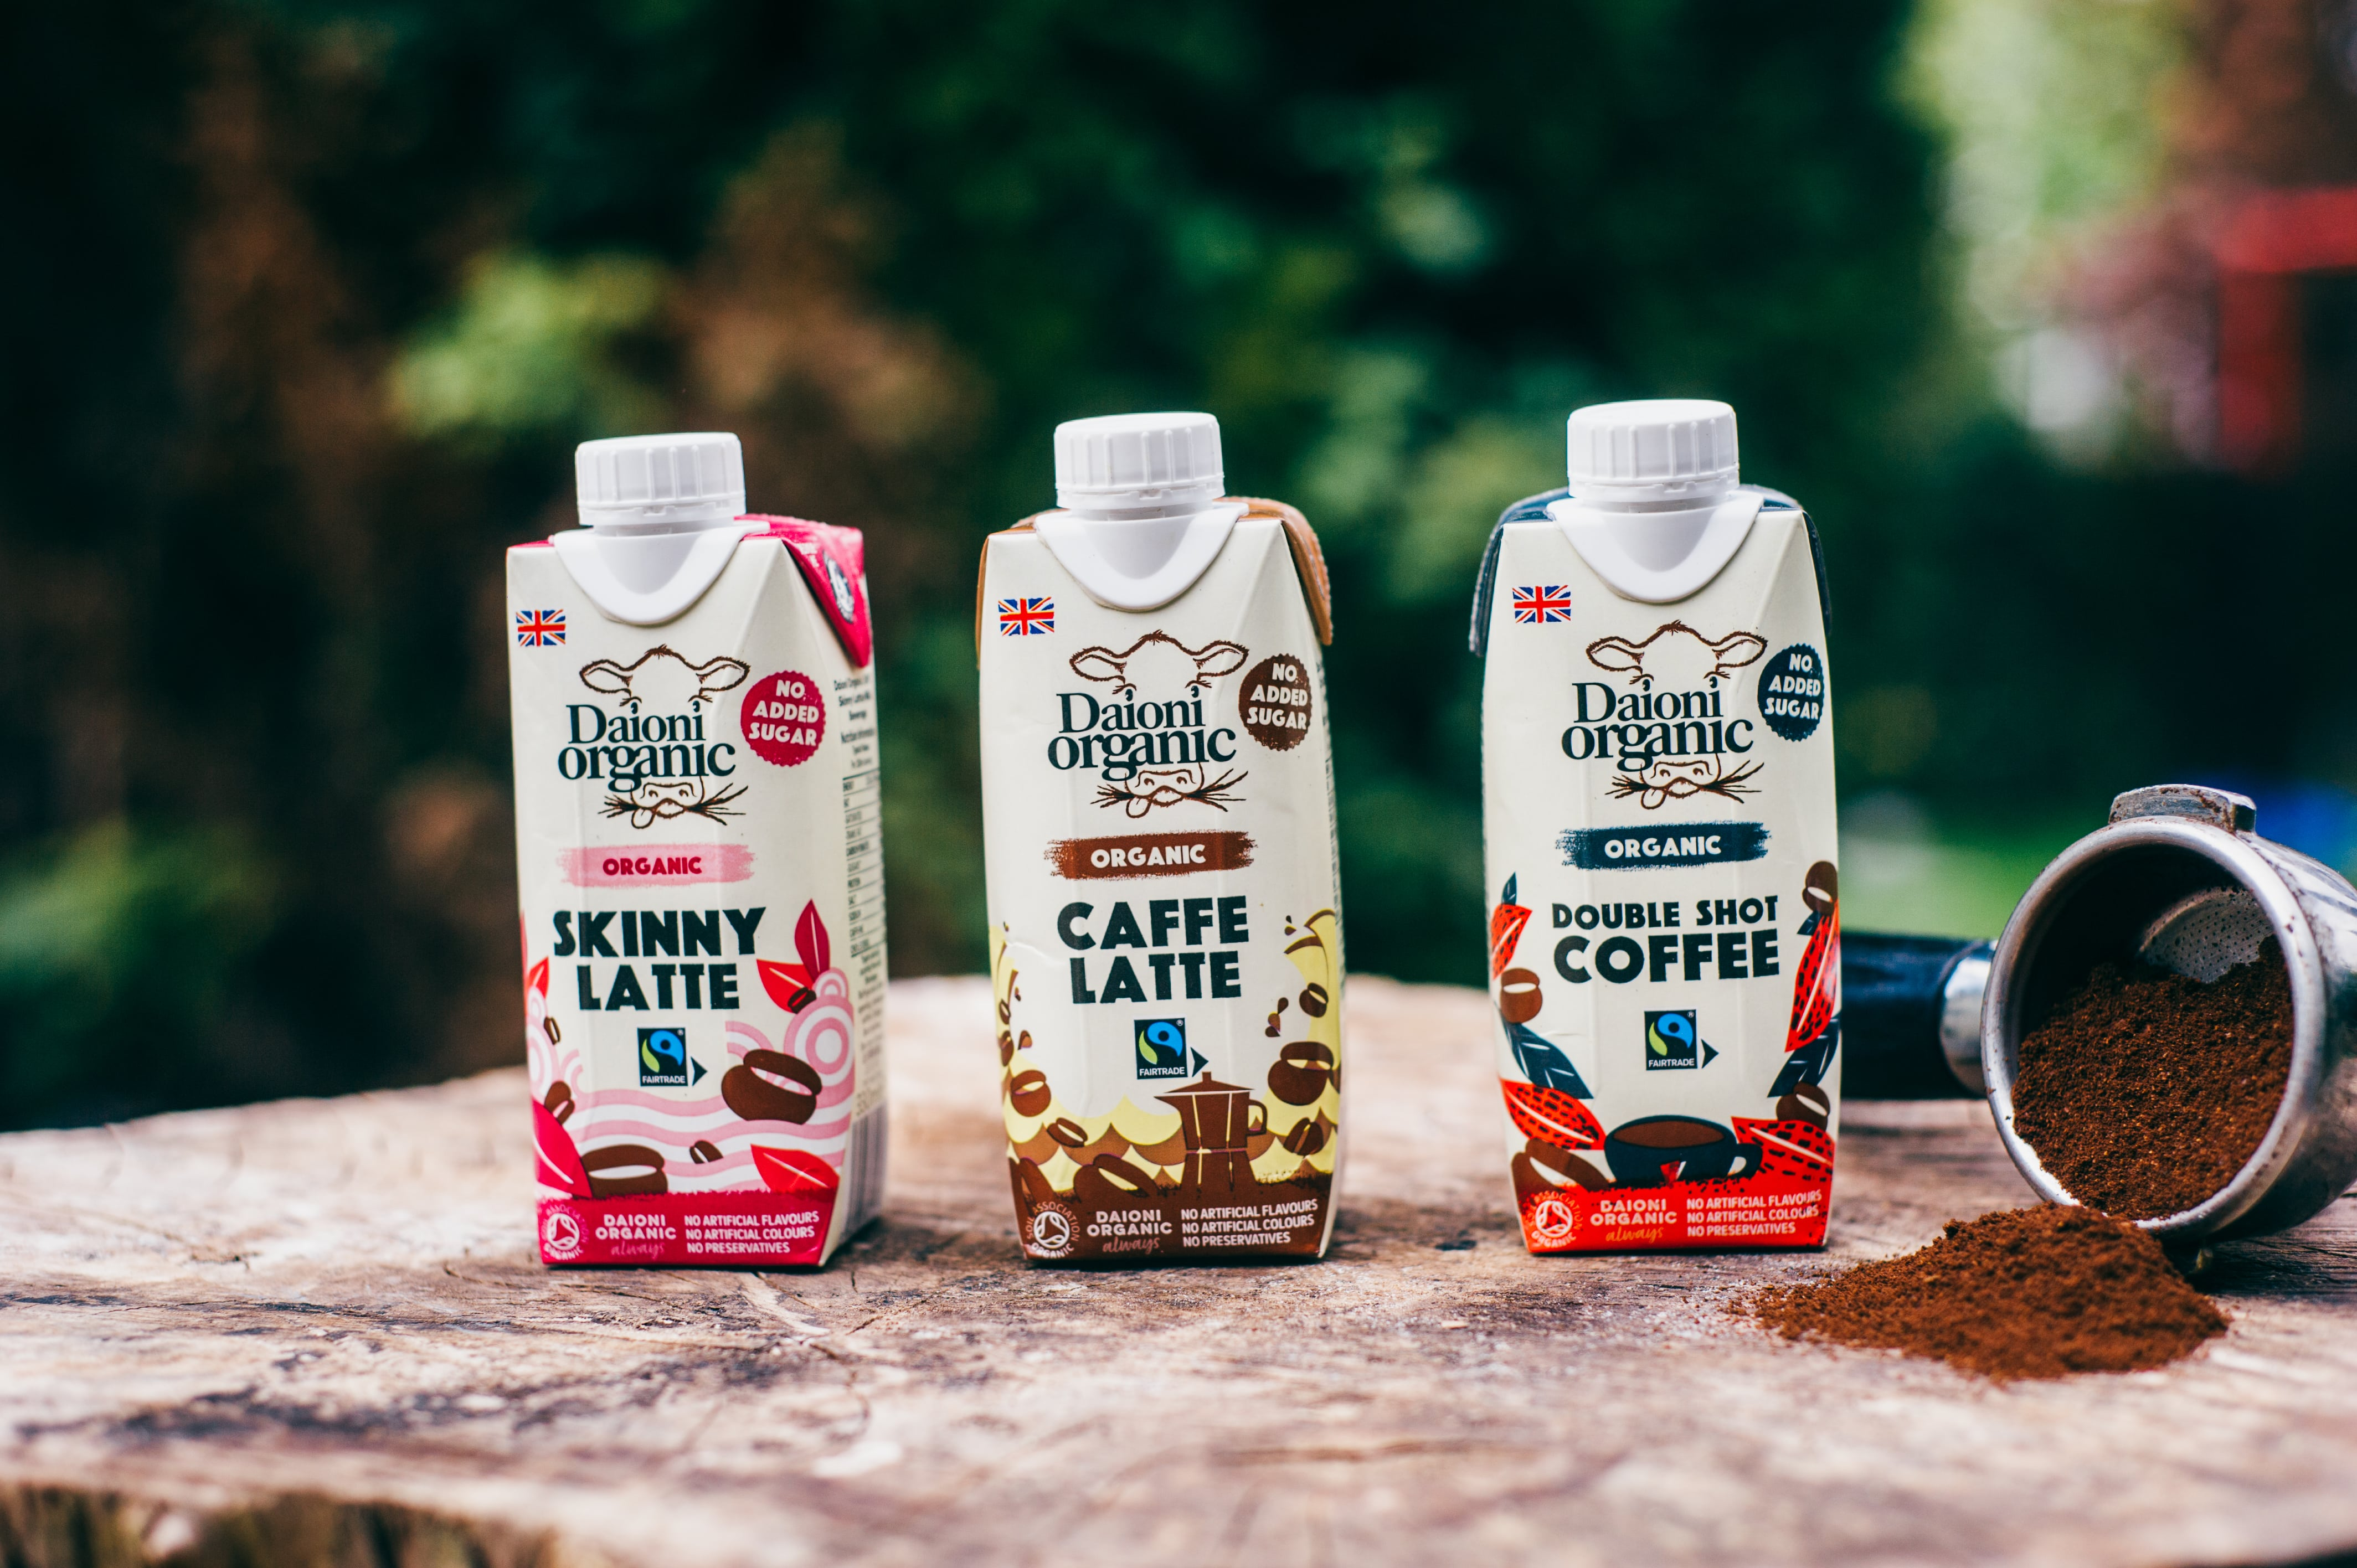 DAIONI ORGANIC LAUNCHES GOOD DAIRY READY TO DRINK COFFEE RANGE